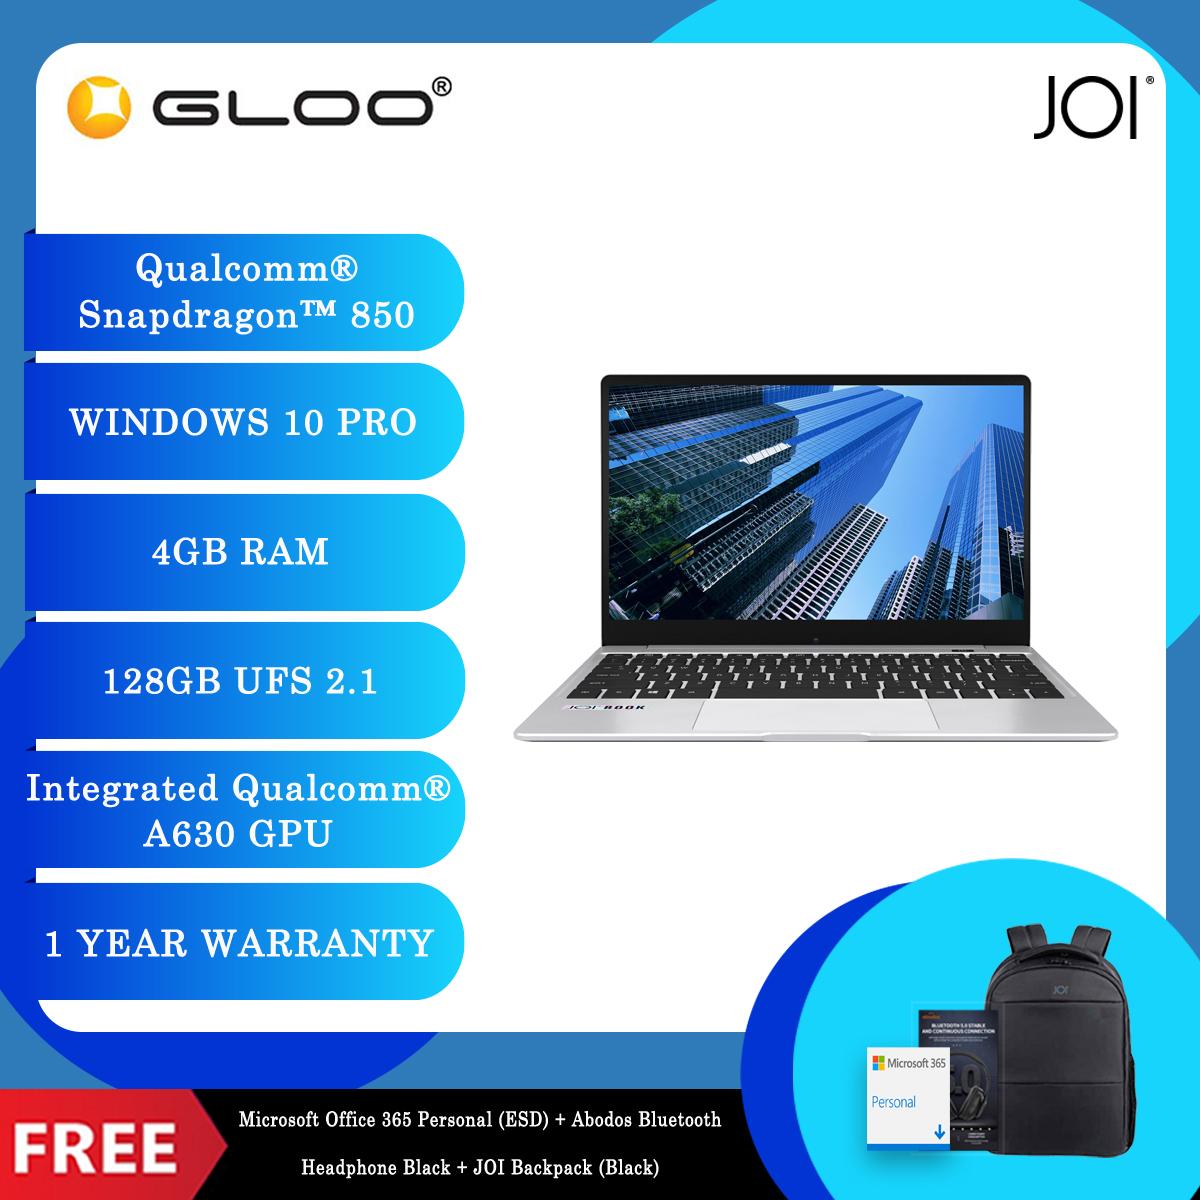 "JOI Book SK3000 (Qualcomm SDM850,Kryo385,4GB,128GB SSD,12.5"",W10Pro,LTE) + Microsoft Office 365 Personal (ESD) + Disposable 3 Layer Face Mask + UGREEN Adapter + Abodos Bluetooth Headphone Black + JOI Backpack (Black) [BPPJOI03KHEPBK]"